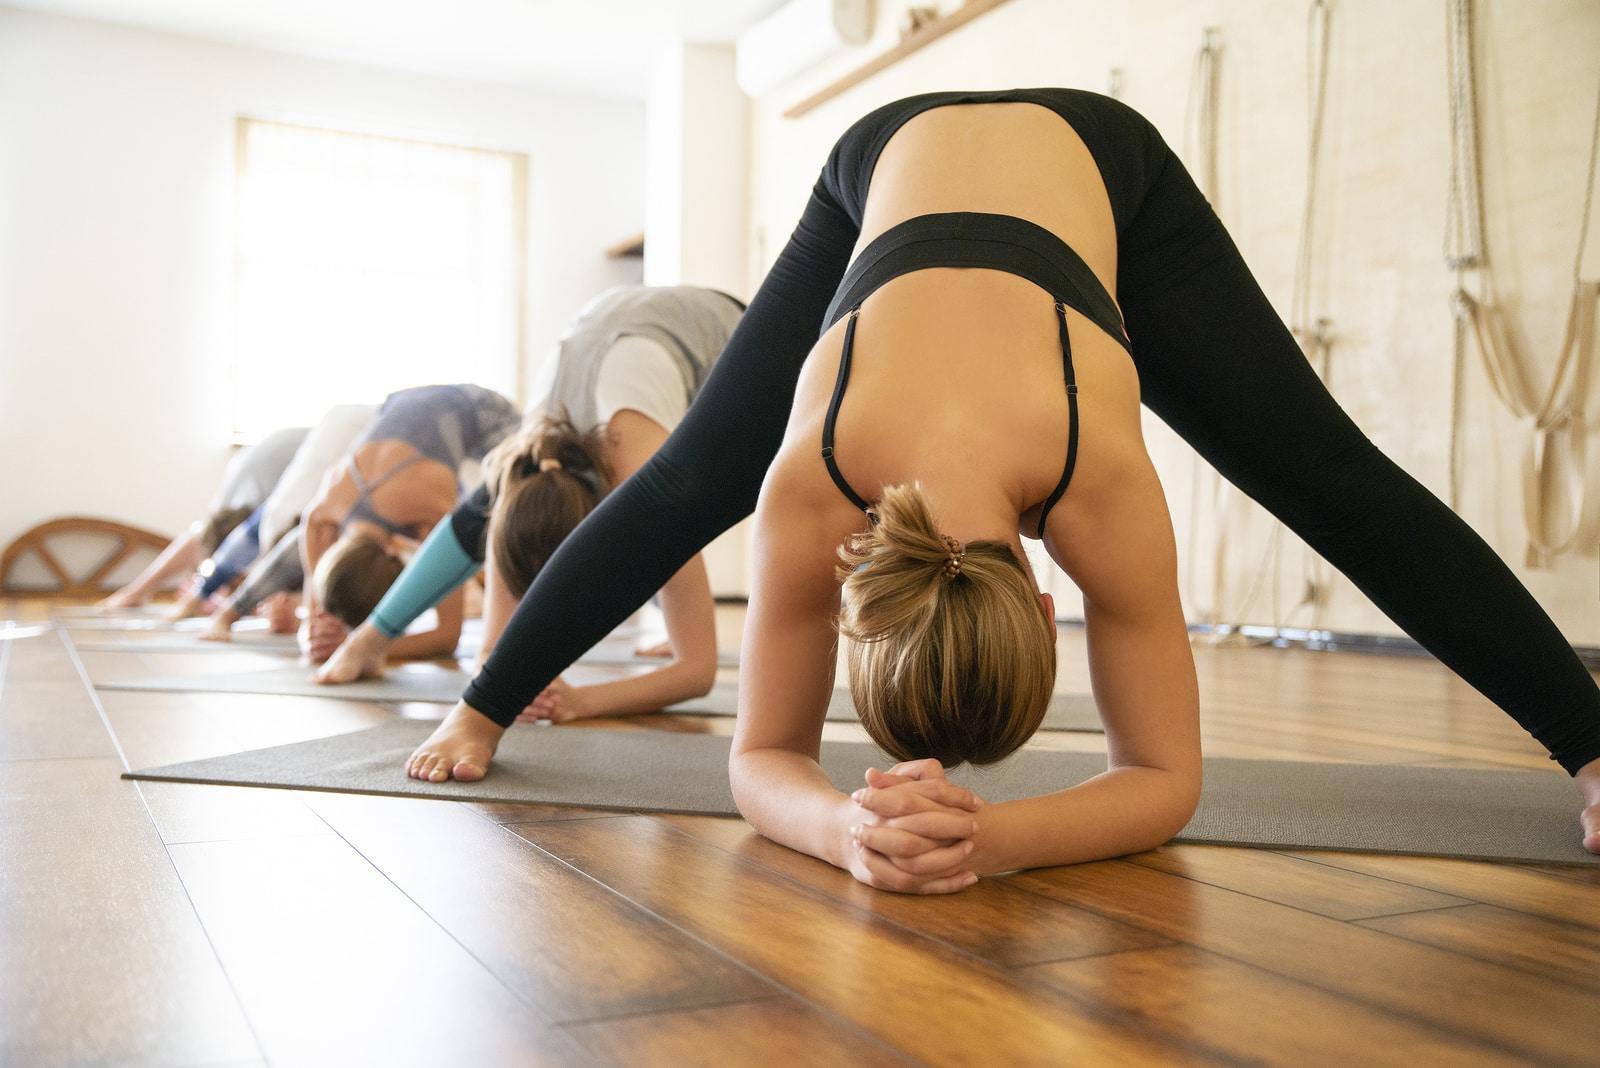 Hot yoga and fertility